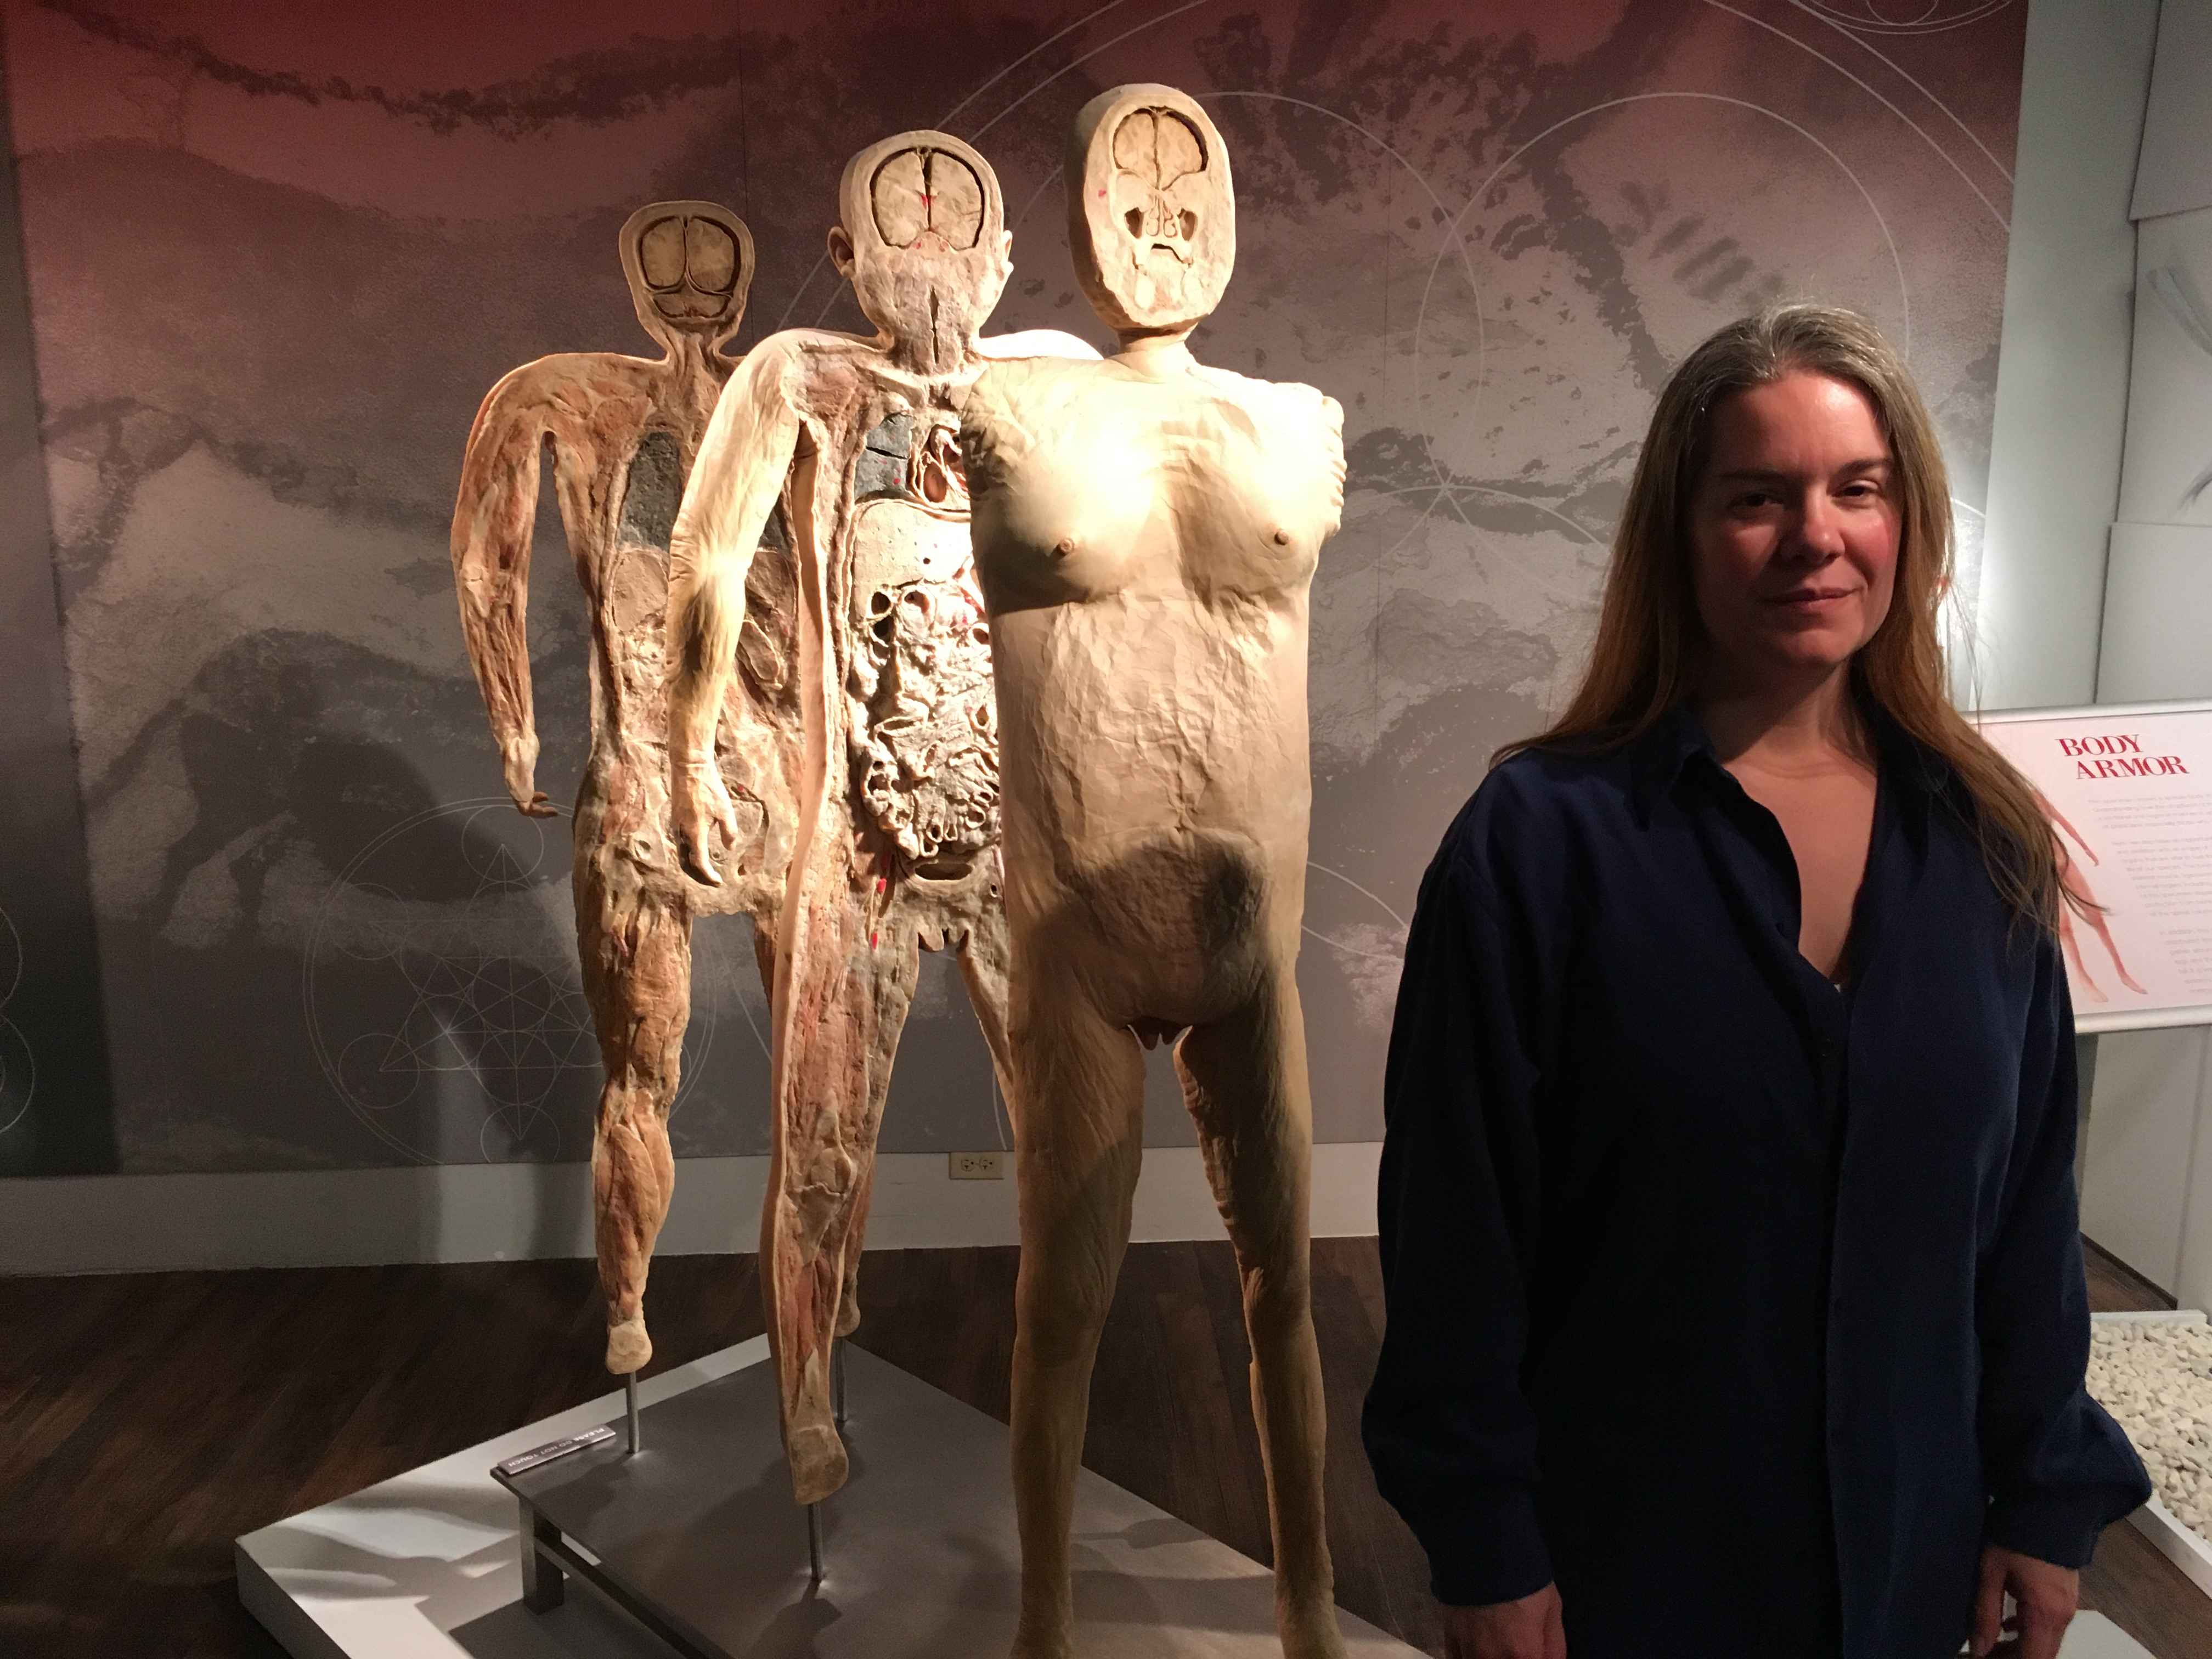 Body Exhibit, Las Vegas, NV